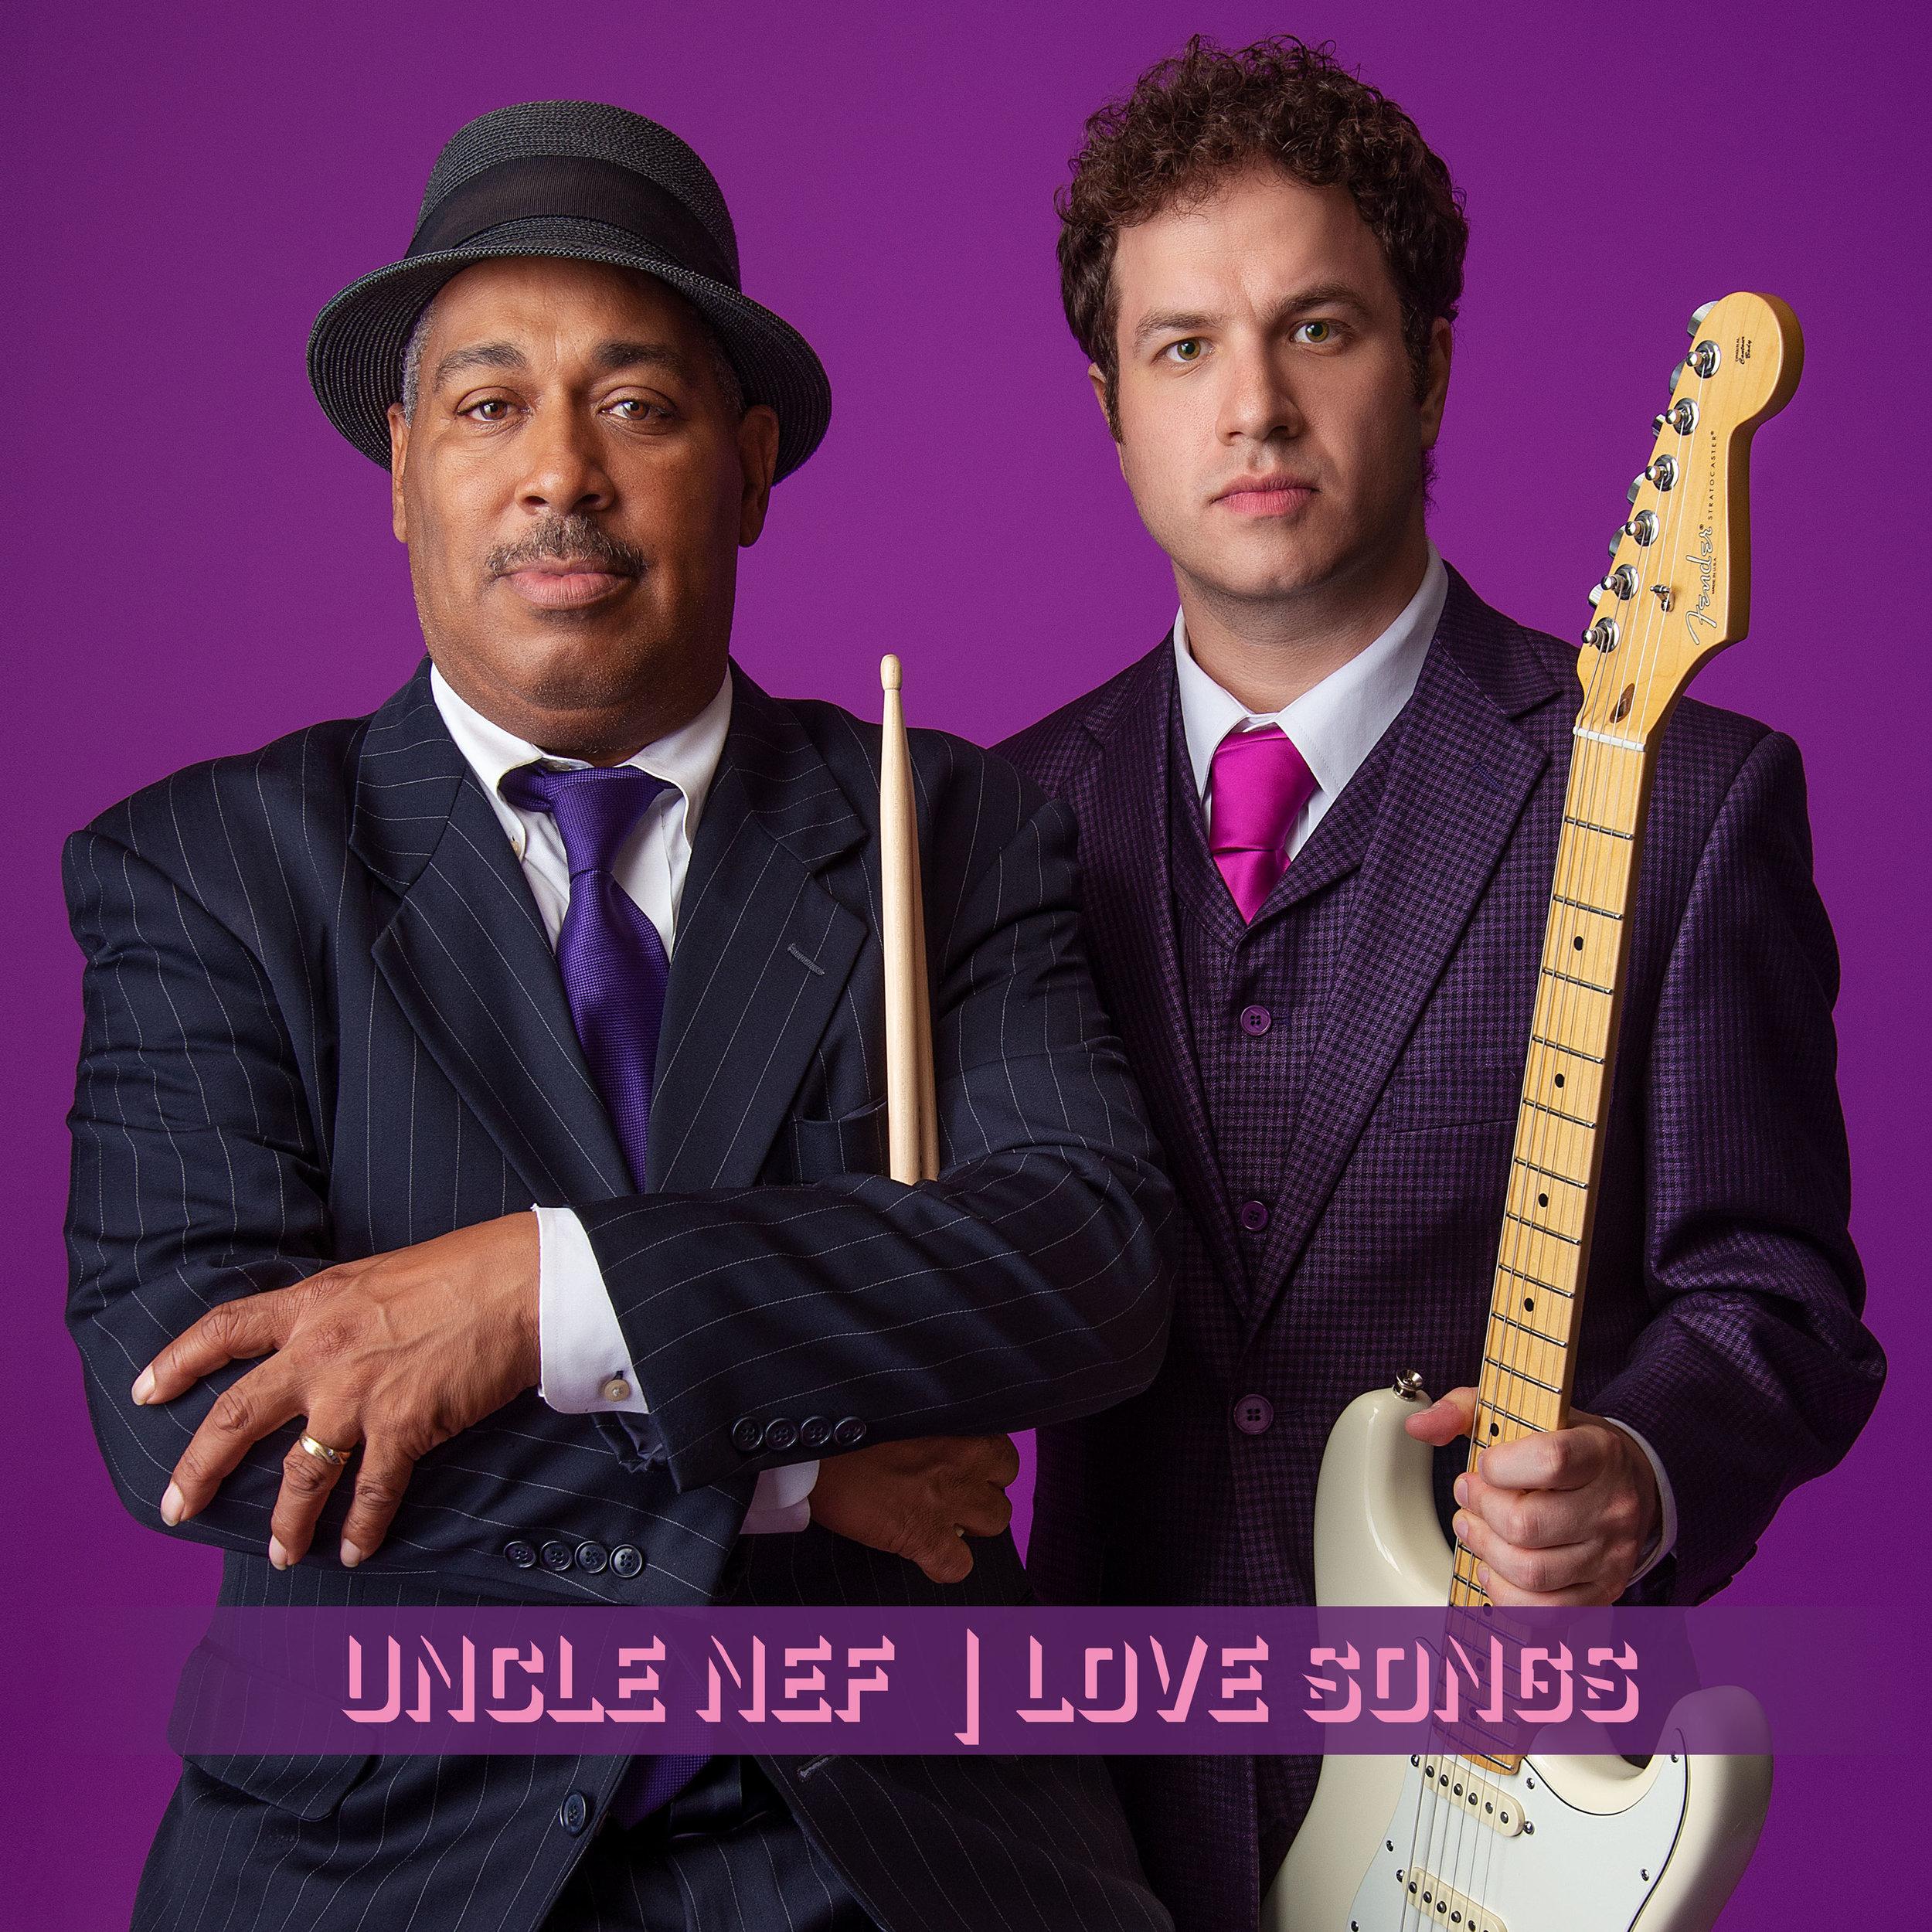 Uncle-Nef-Love-Songs-LP-Album-Art-1---1x1-3000px.jpg